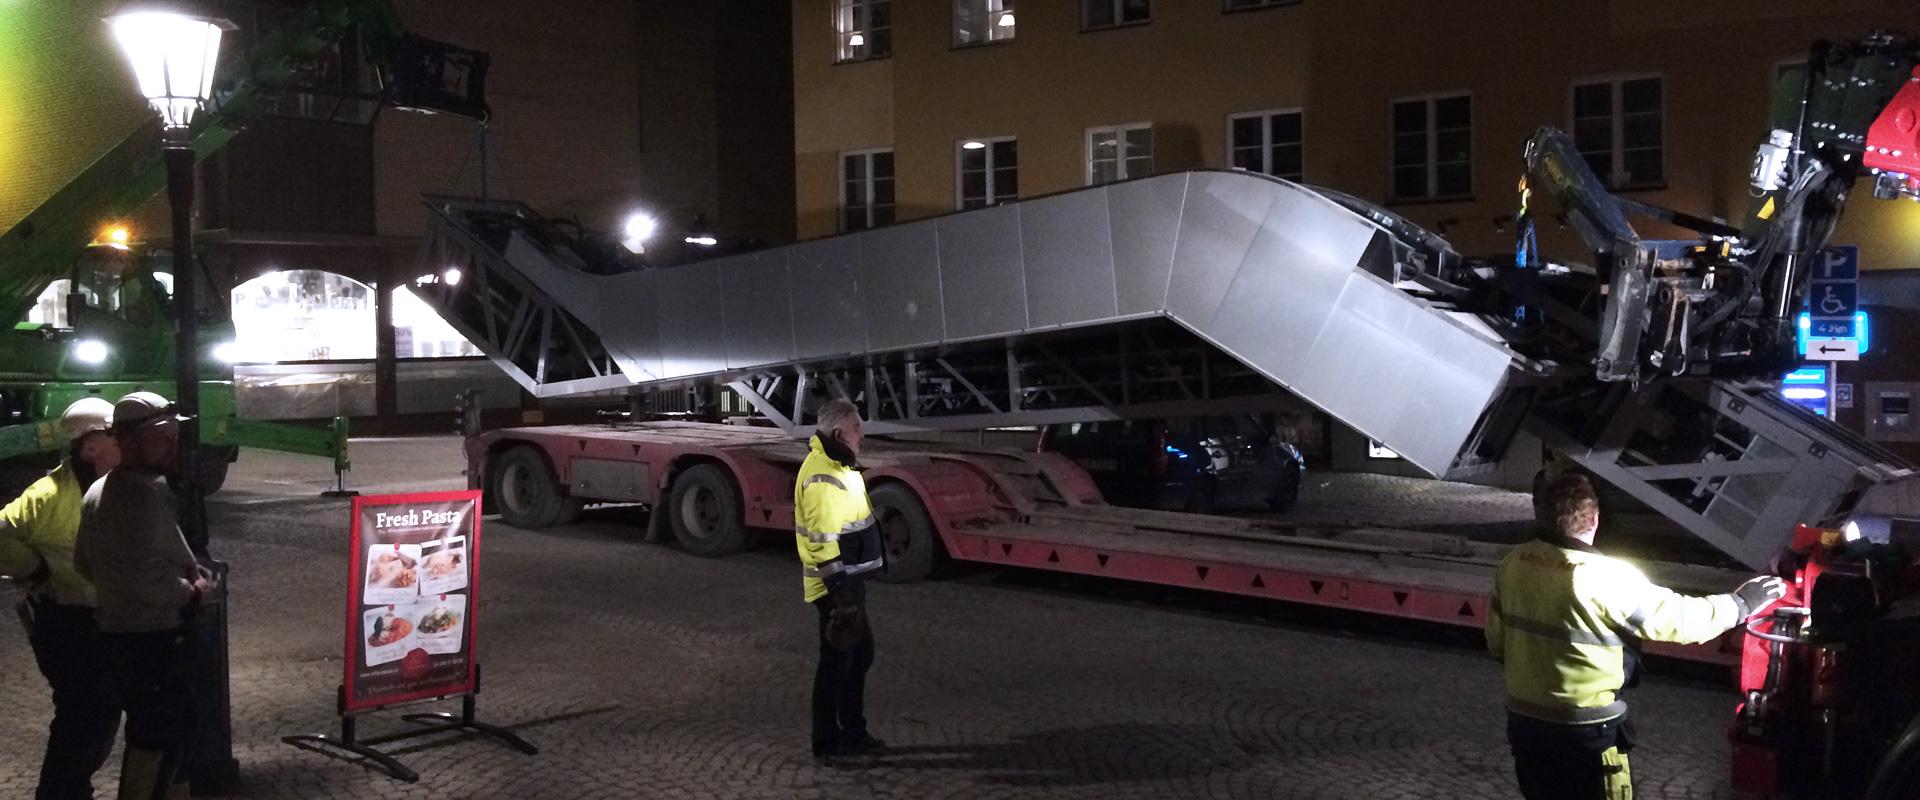 Big demolition project in Uppsala